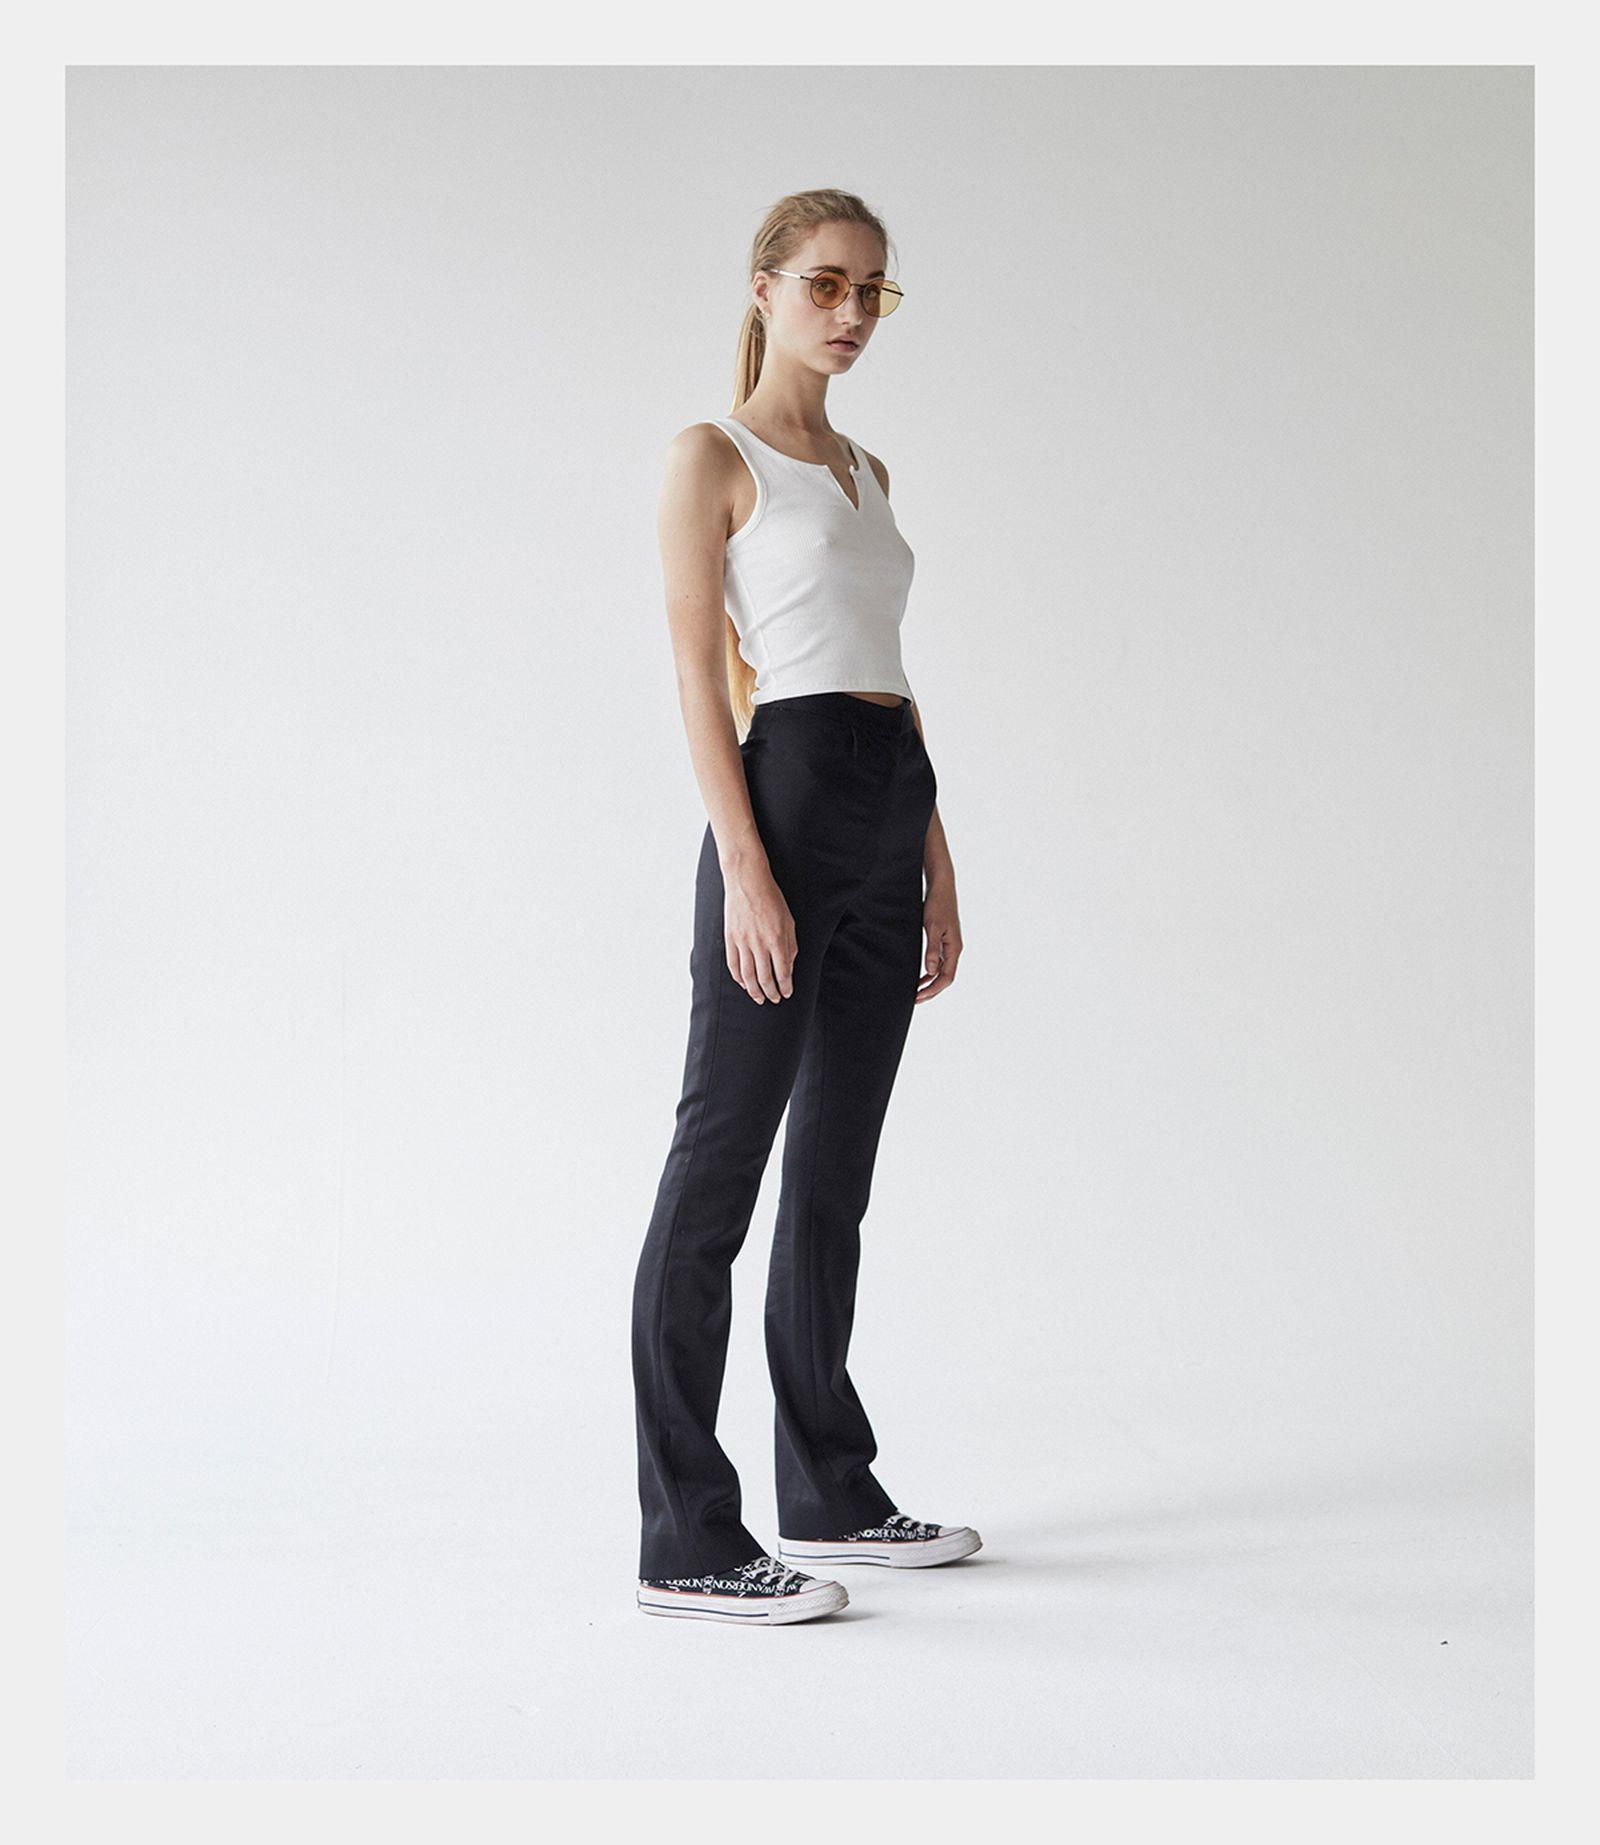 Vest: WEEKDAY. Trouser: STEVE O'SMITH. Sneakers: CONVERSE x J.W. ANDERSON. Sunglasses: MYKITA STUDIO.